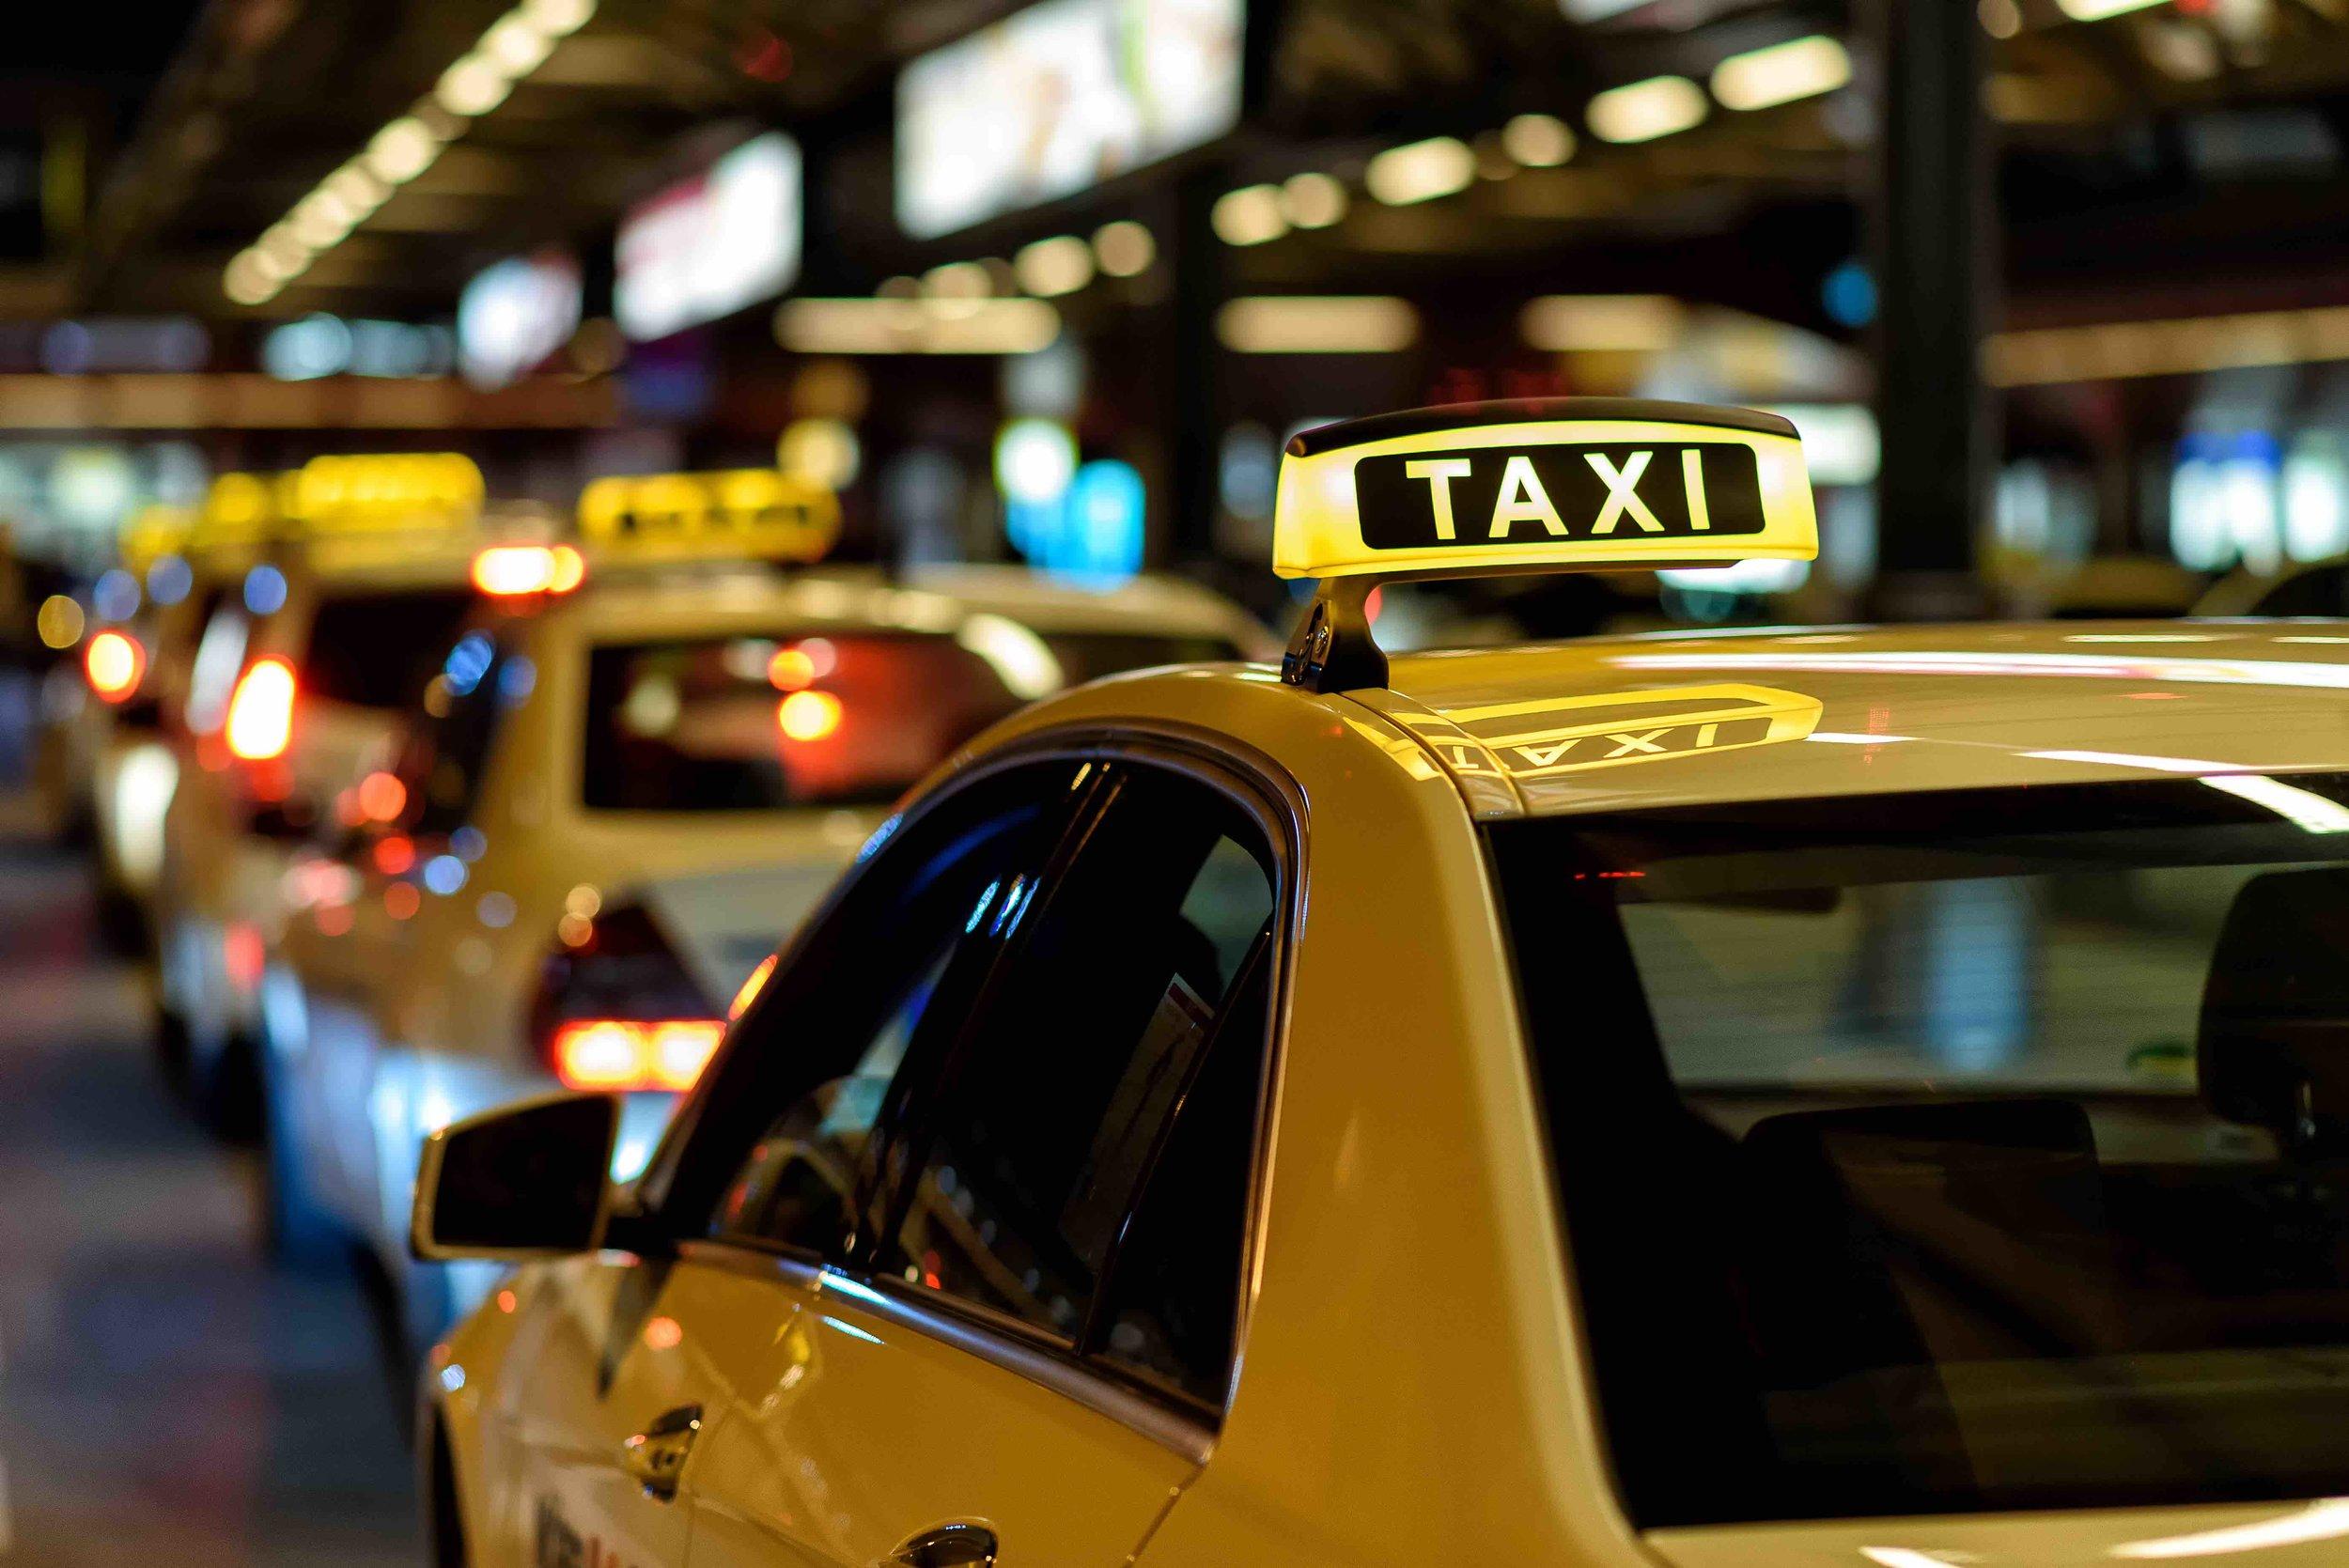 iStock-519870714 taxi transfer.jpg